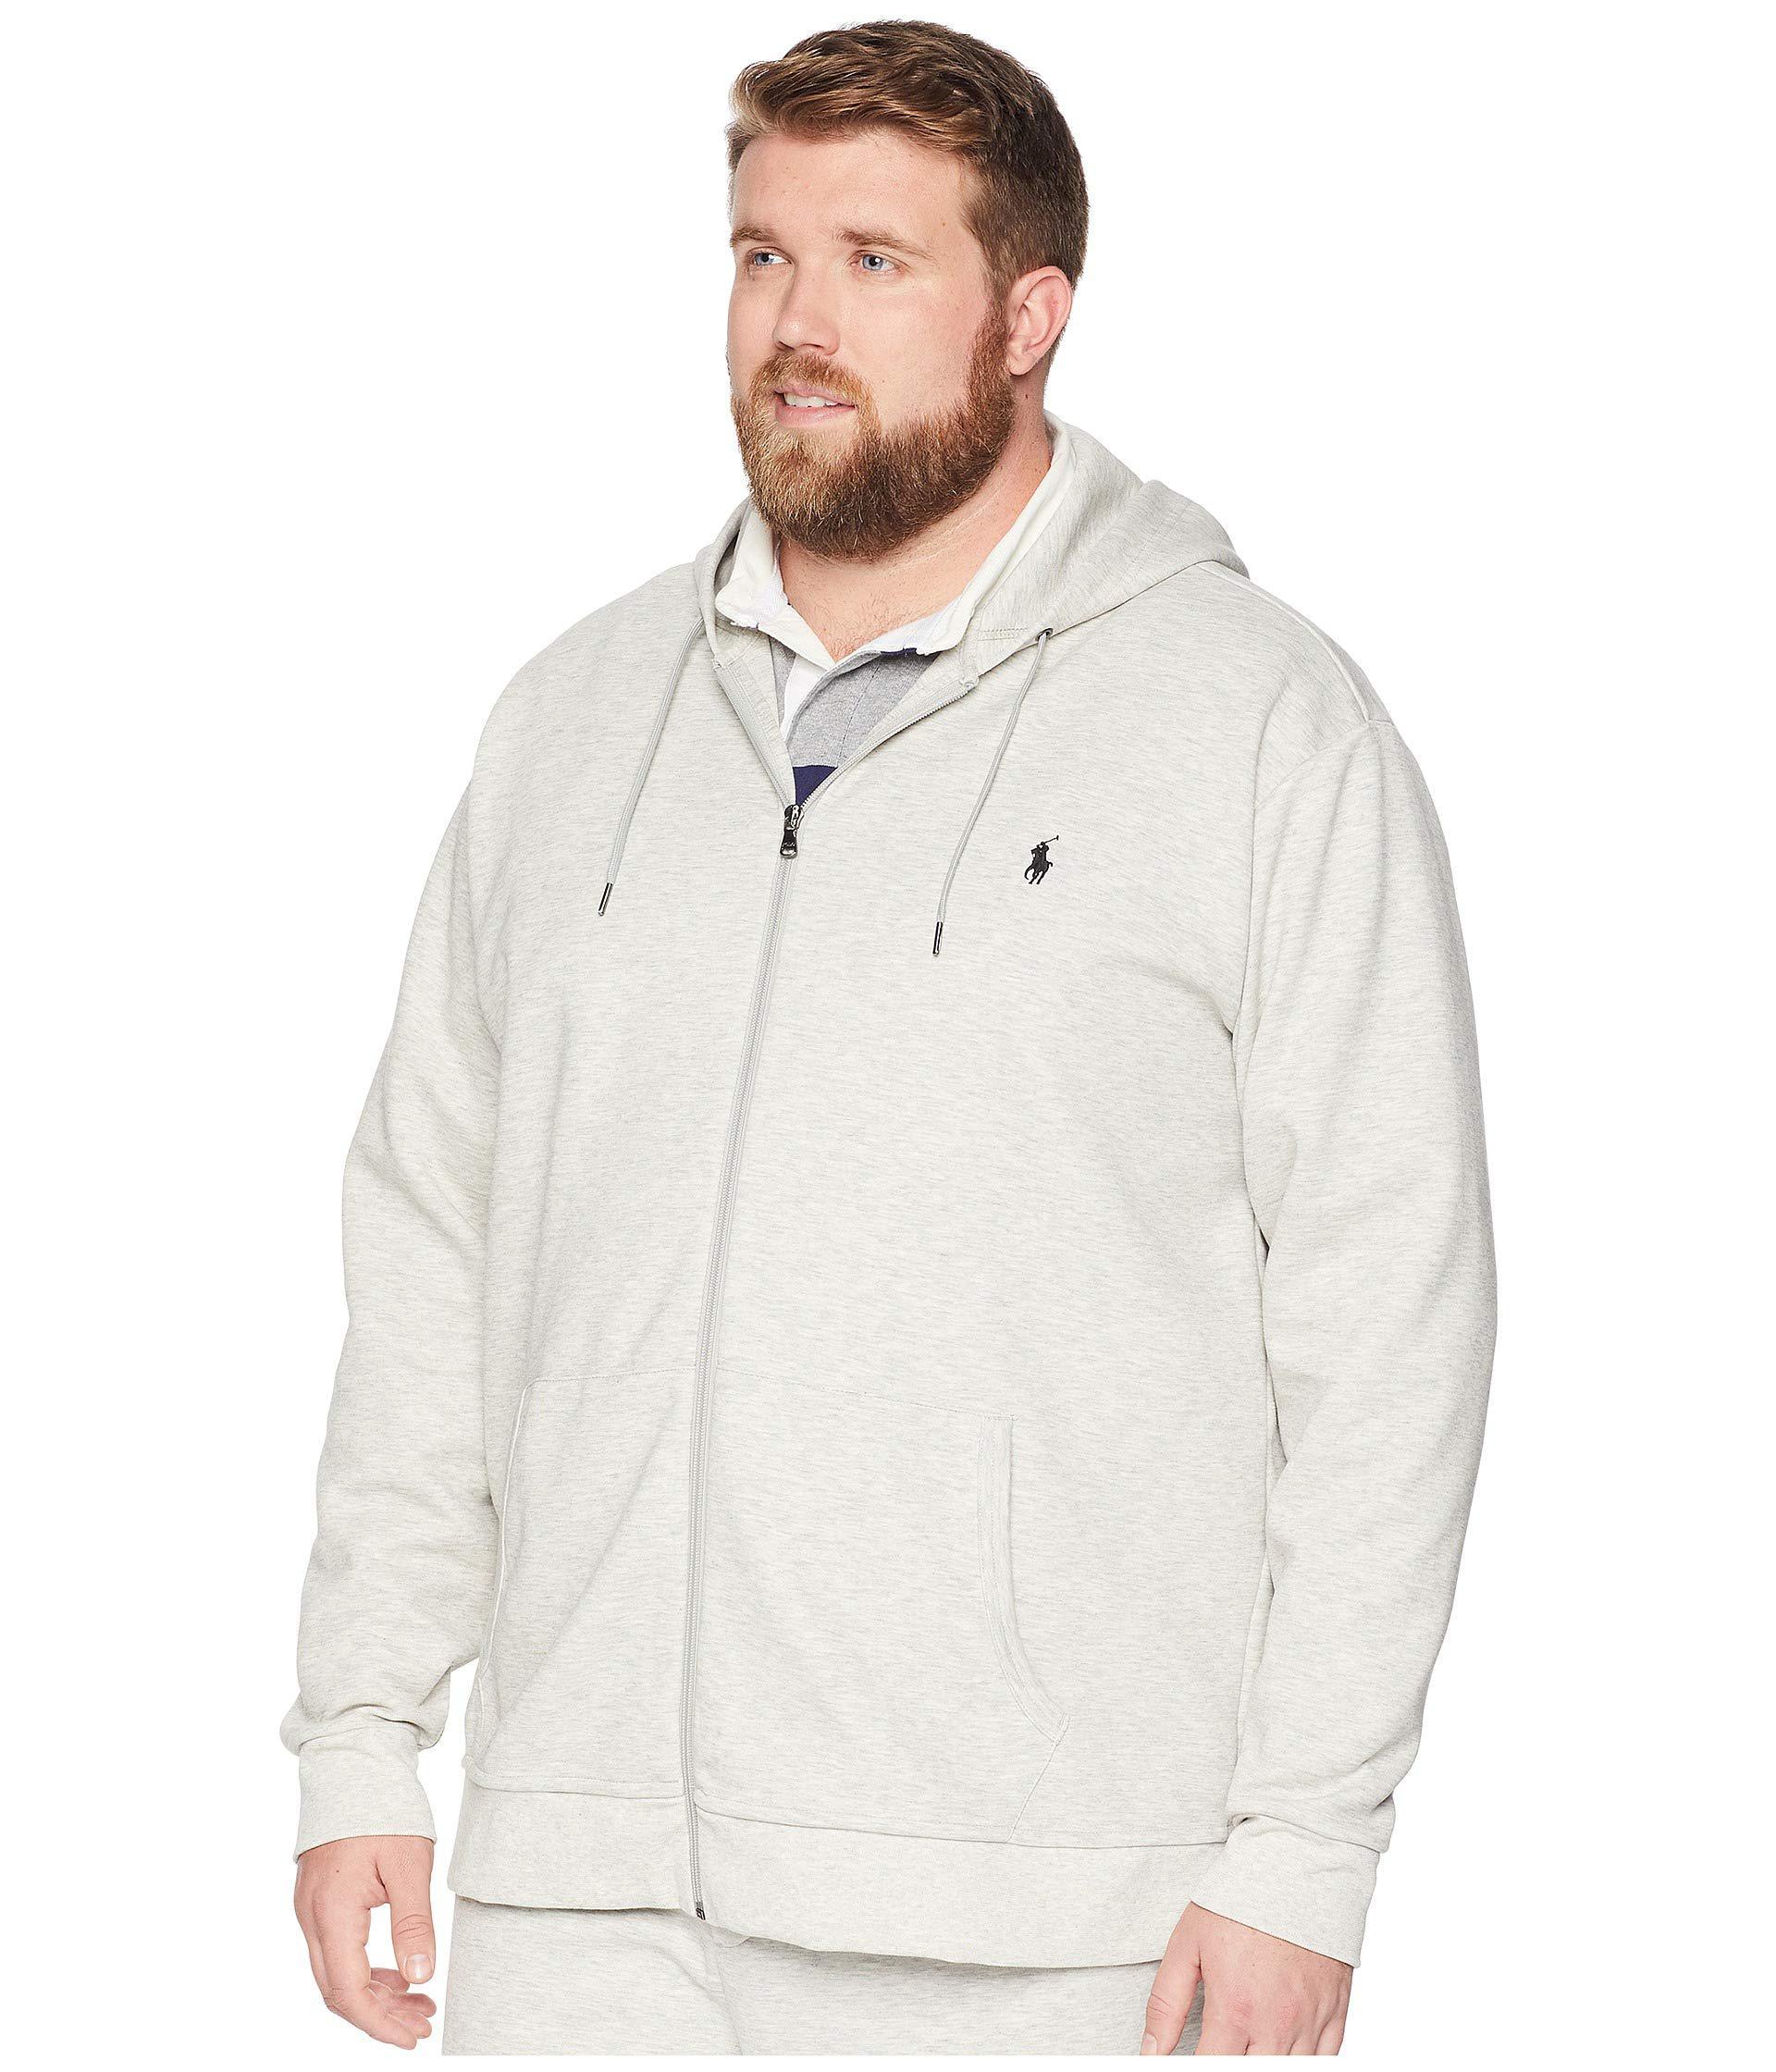 Lyst - Polo Ralph Lauren Big Tall Double Knit Full Zip (light Sport  Heather) Men s Clothing in Gray for Men 71d5a53e3